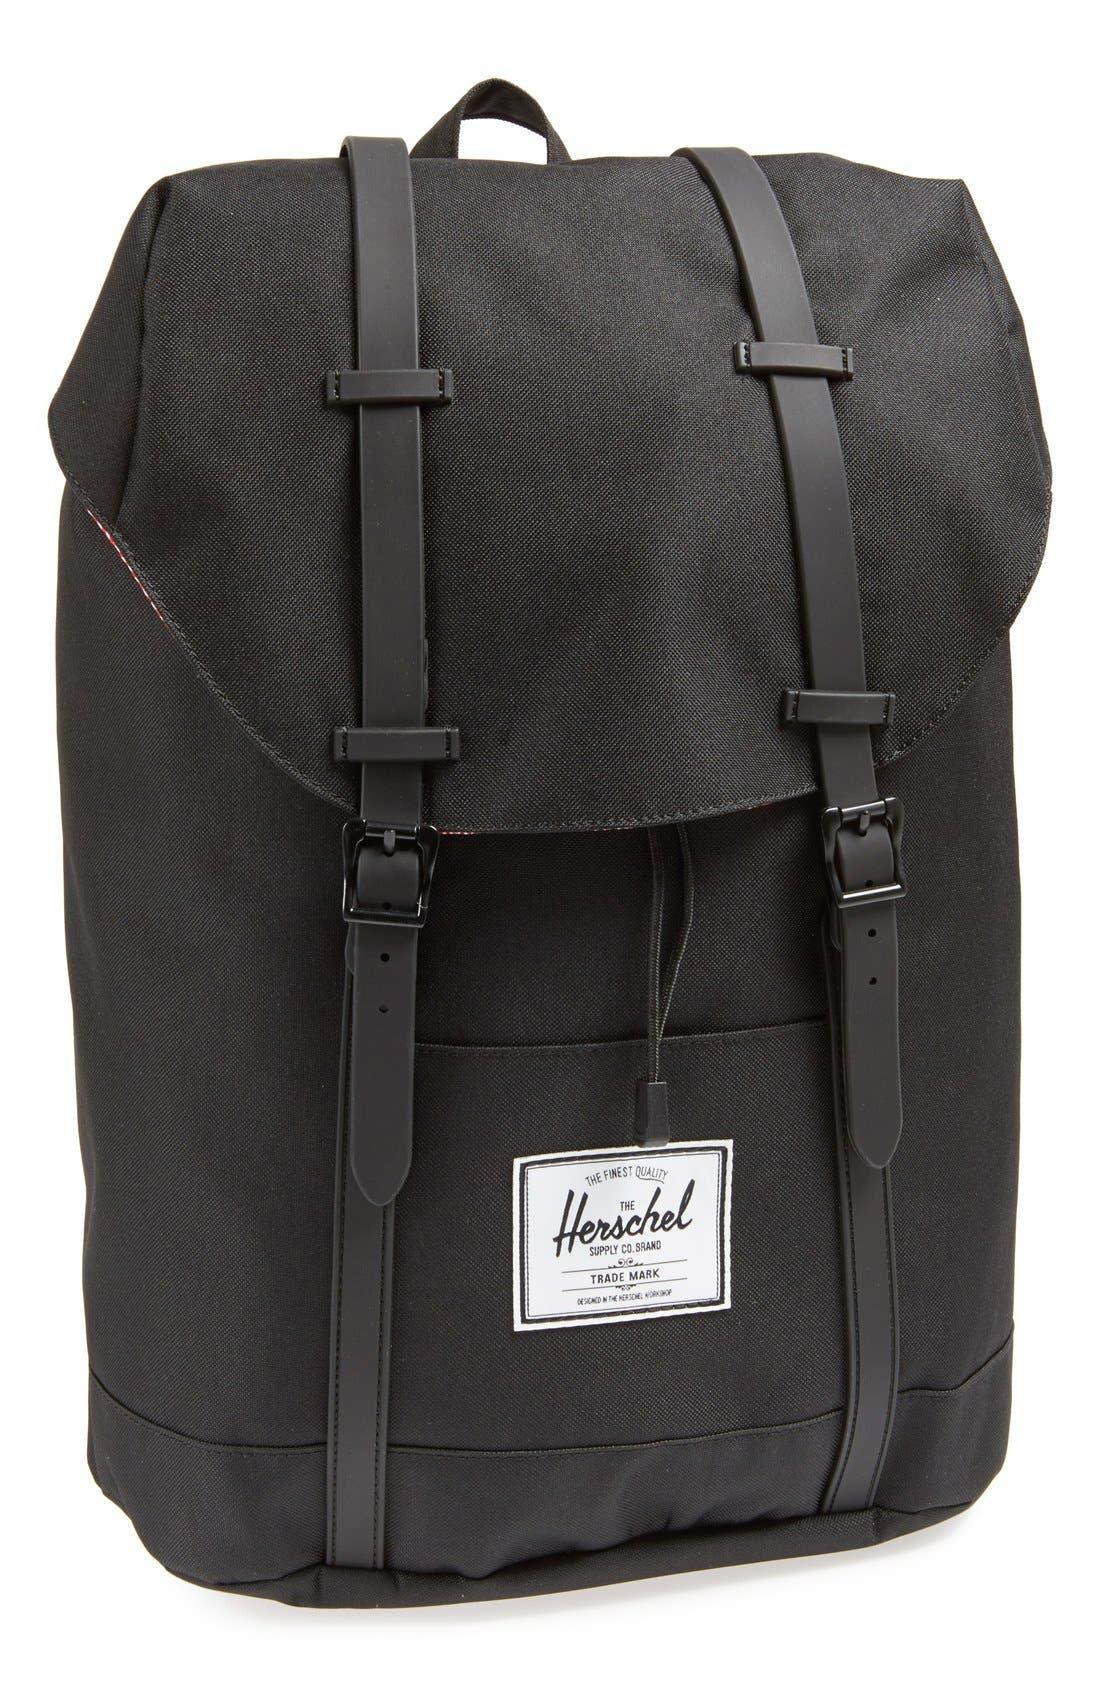 Alternate Image 1 Selected - Herschel Supply Co. 'Retreat' Backpack